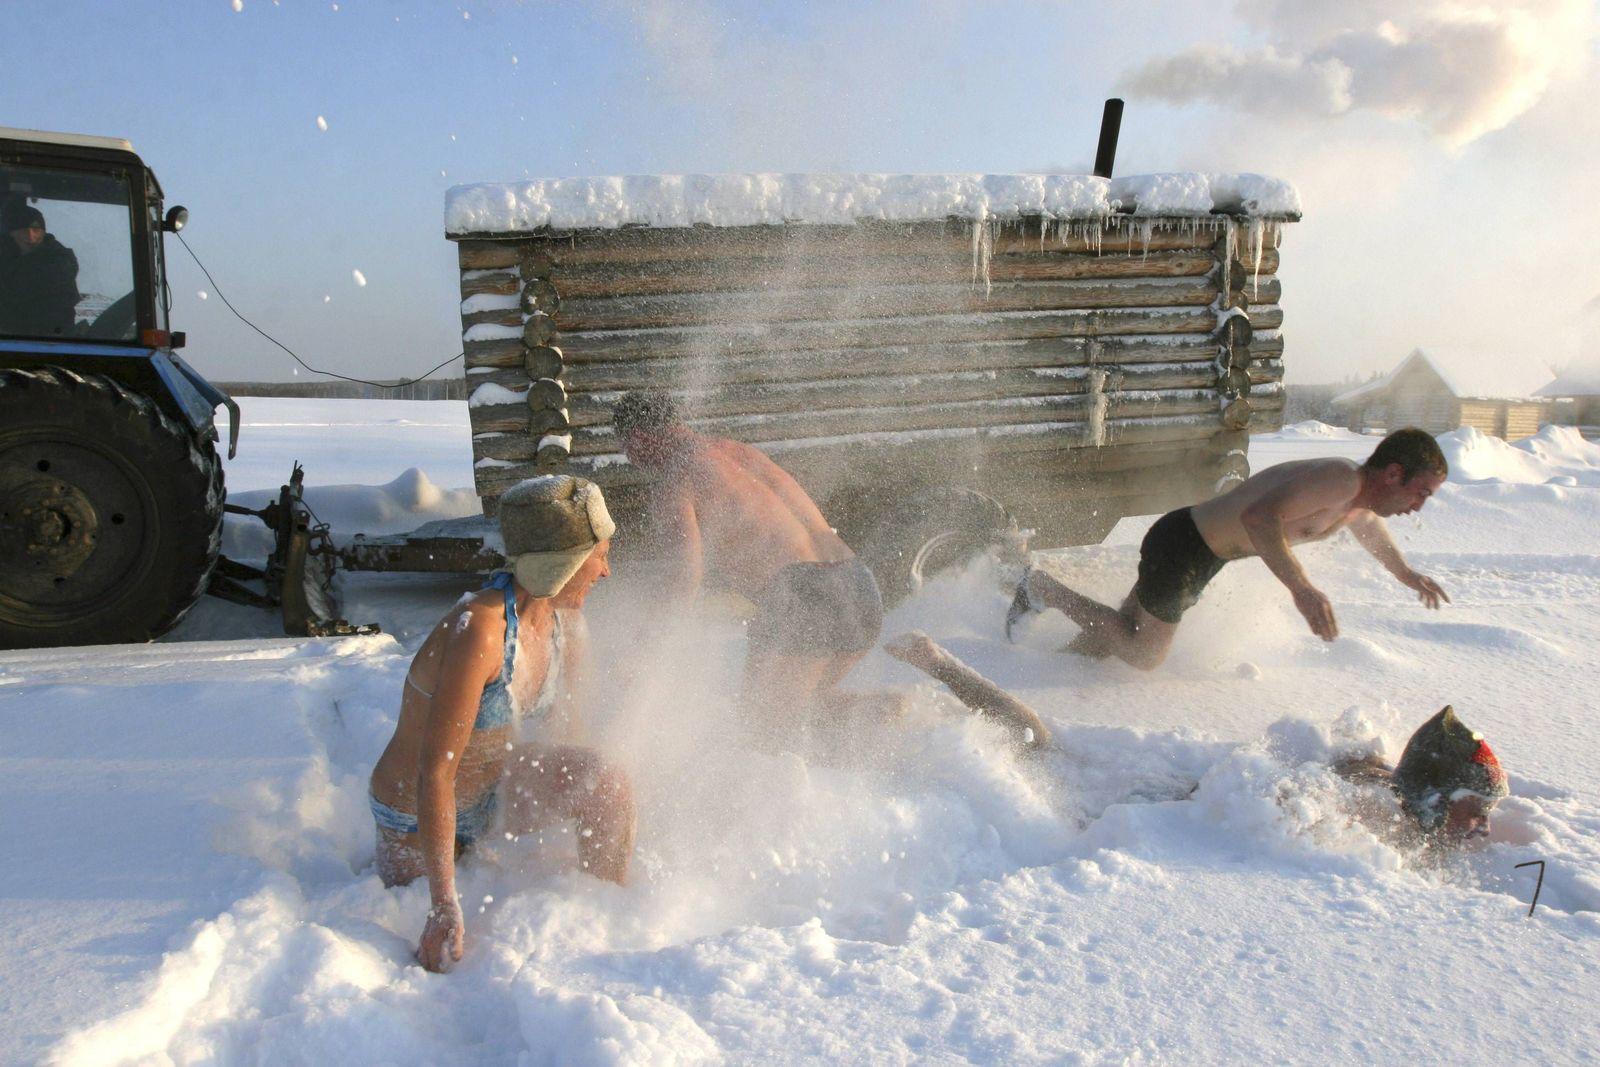 Sauna in Russland